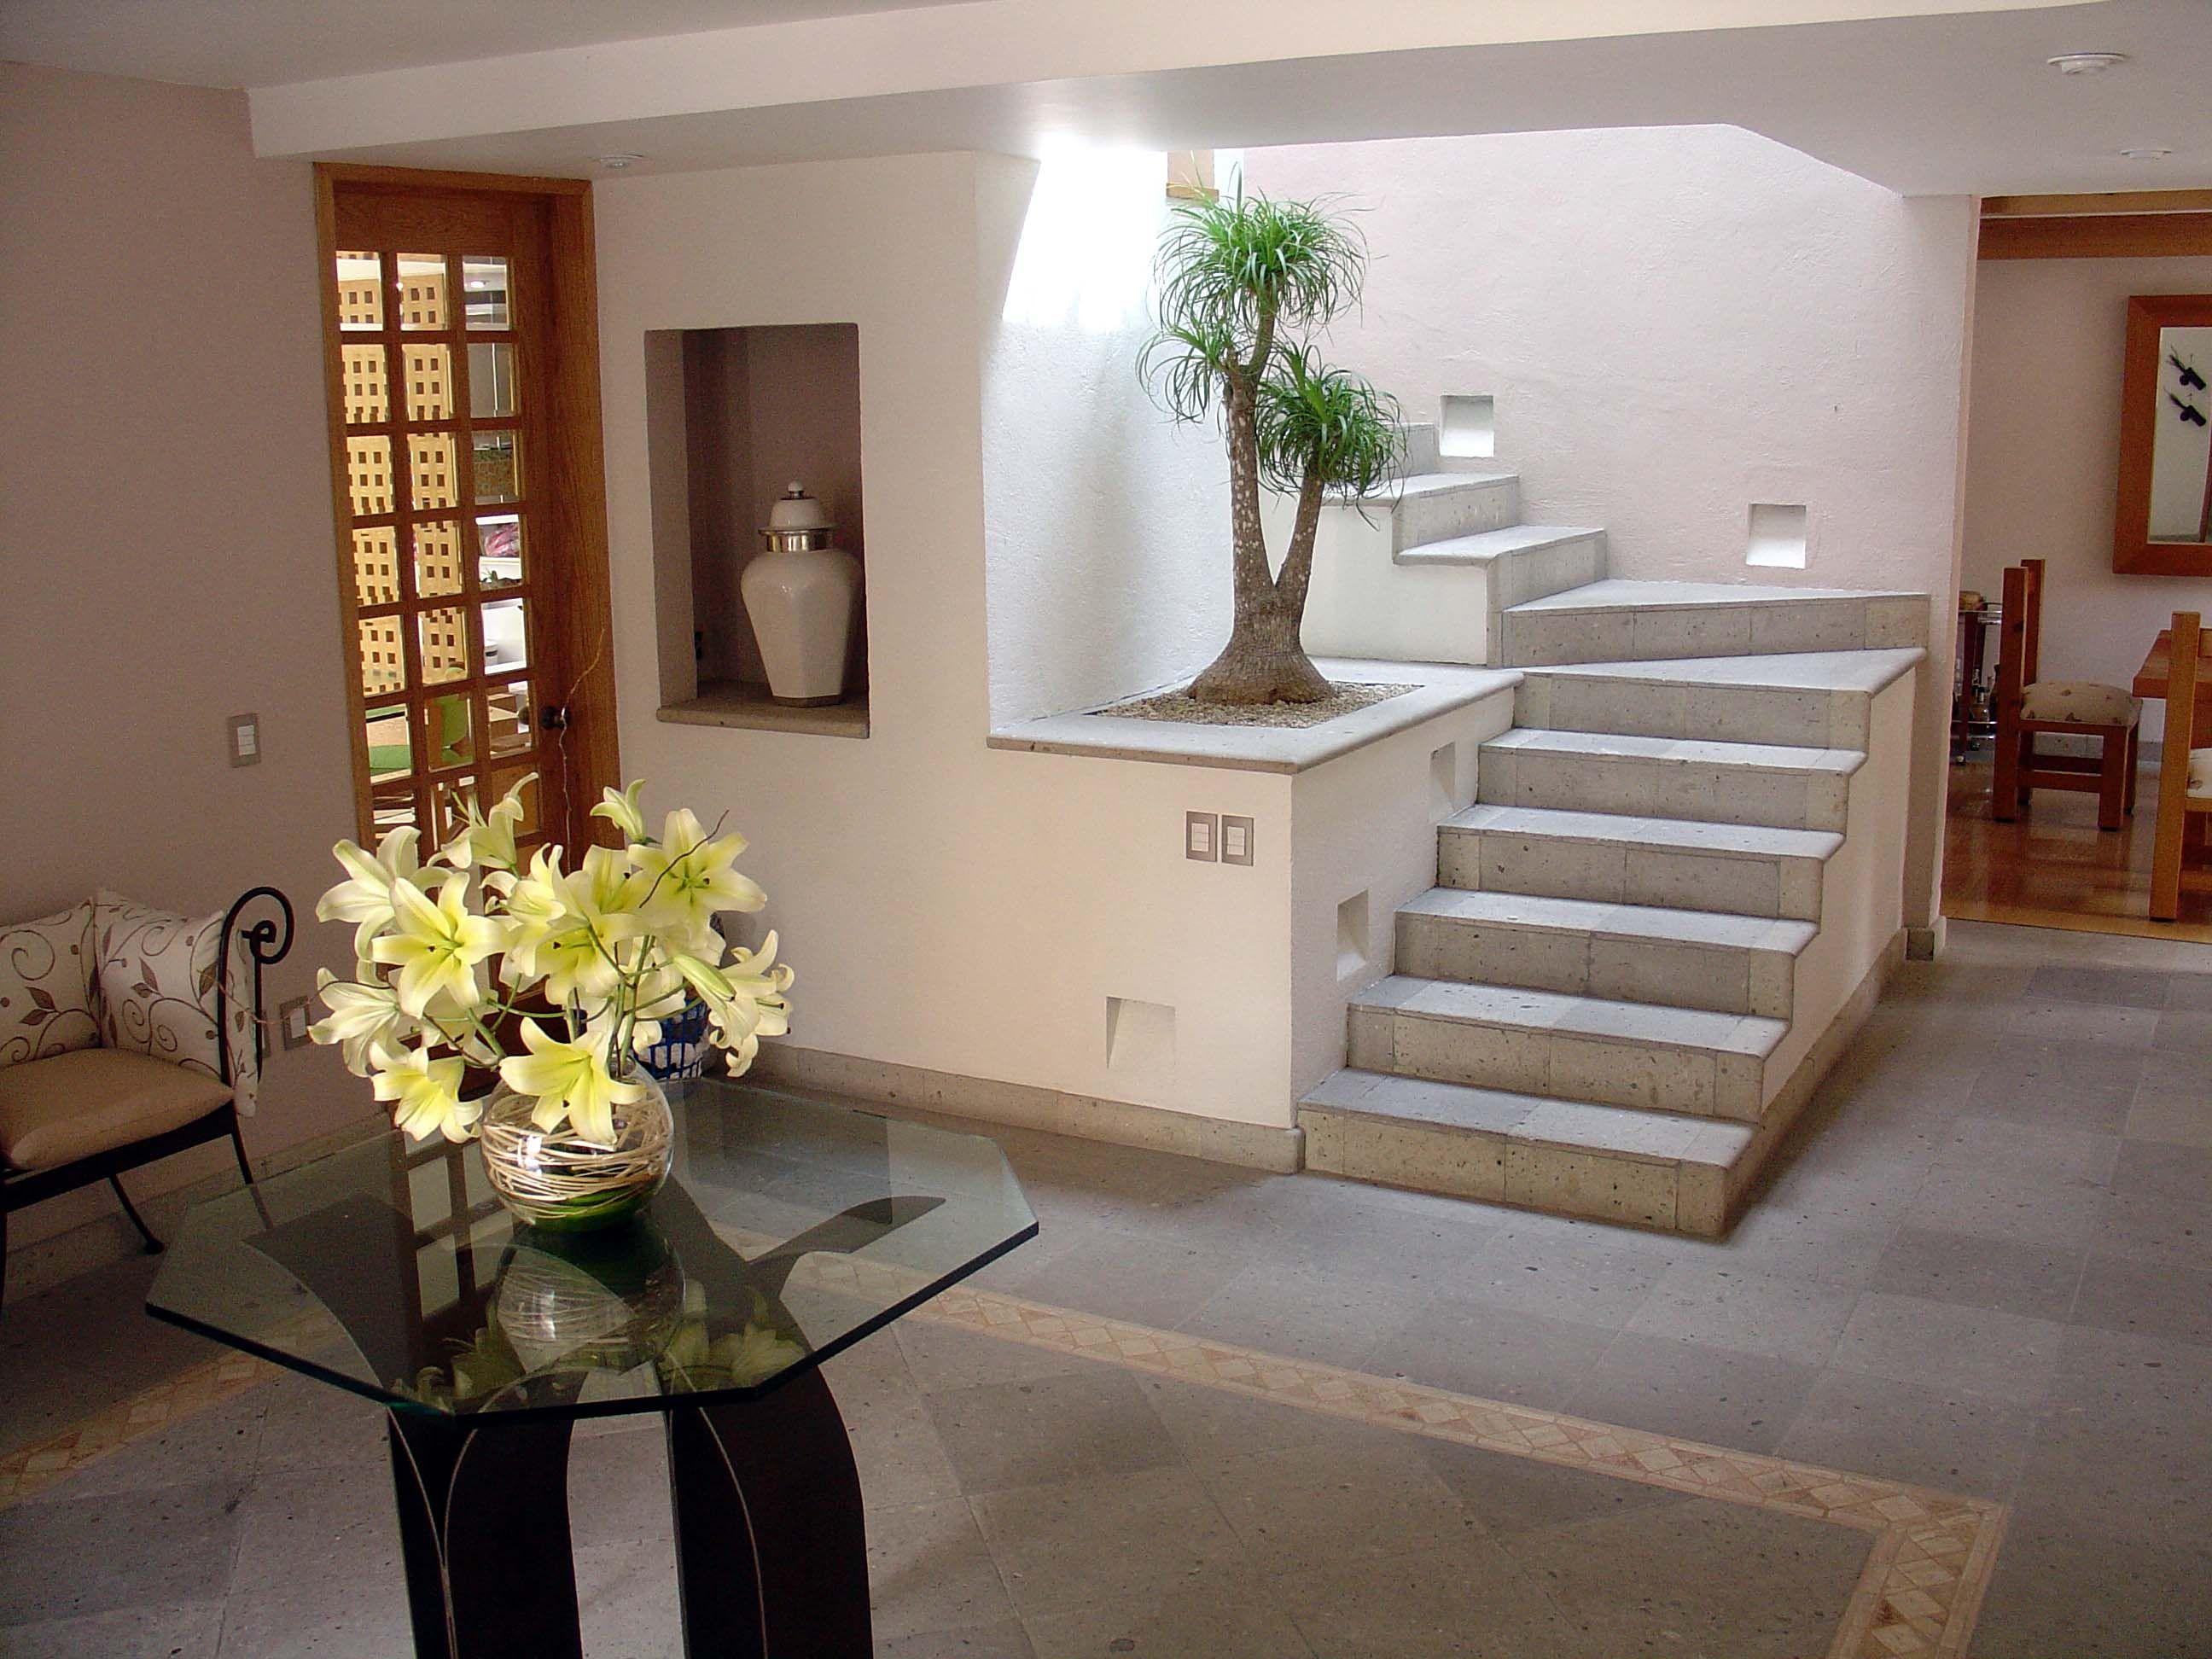 Pisos de cantera pisos de cer mica en 2019 ceramica for Decoracion de interiores monterrey